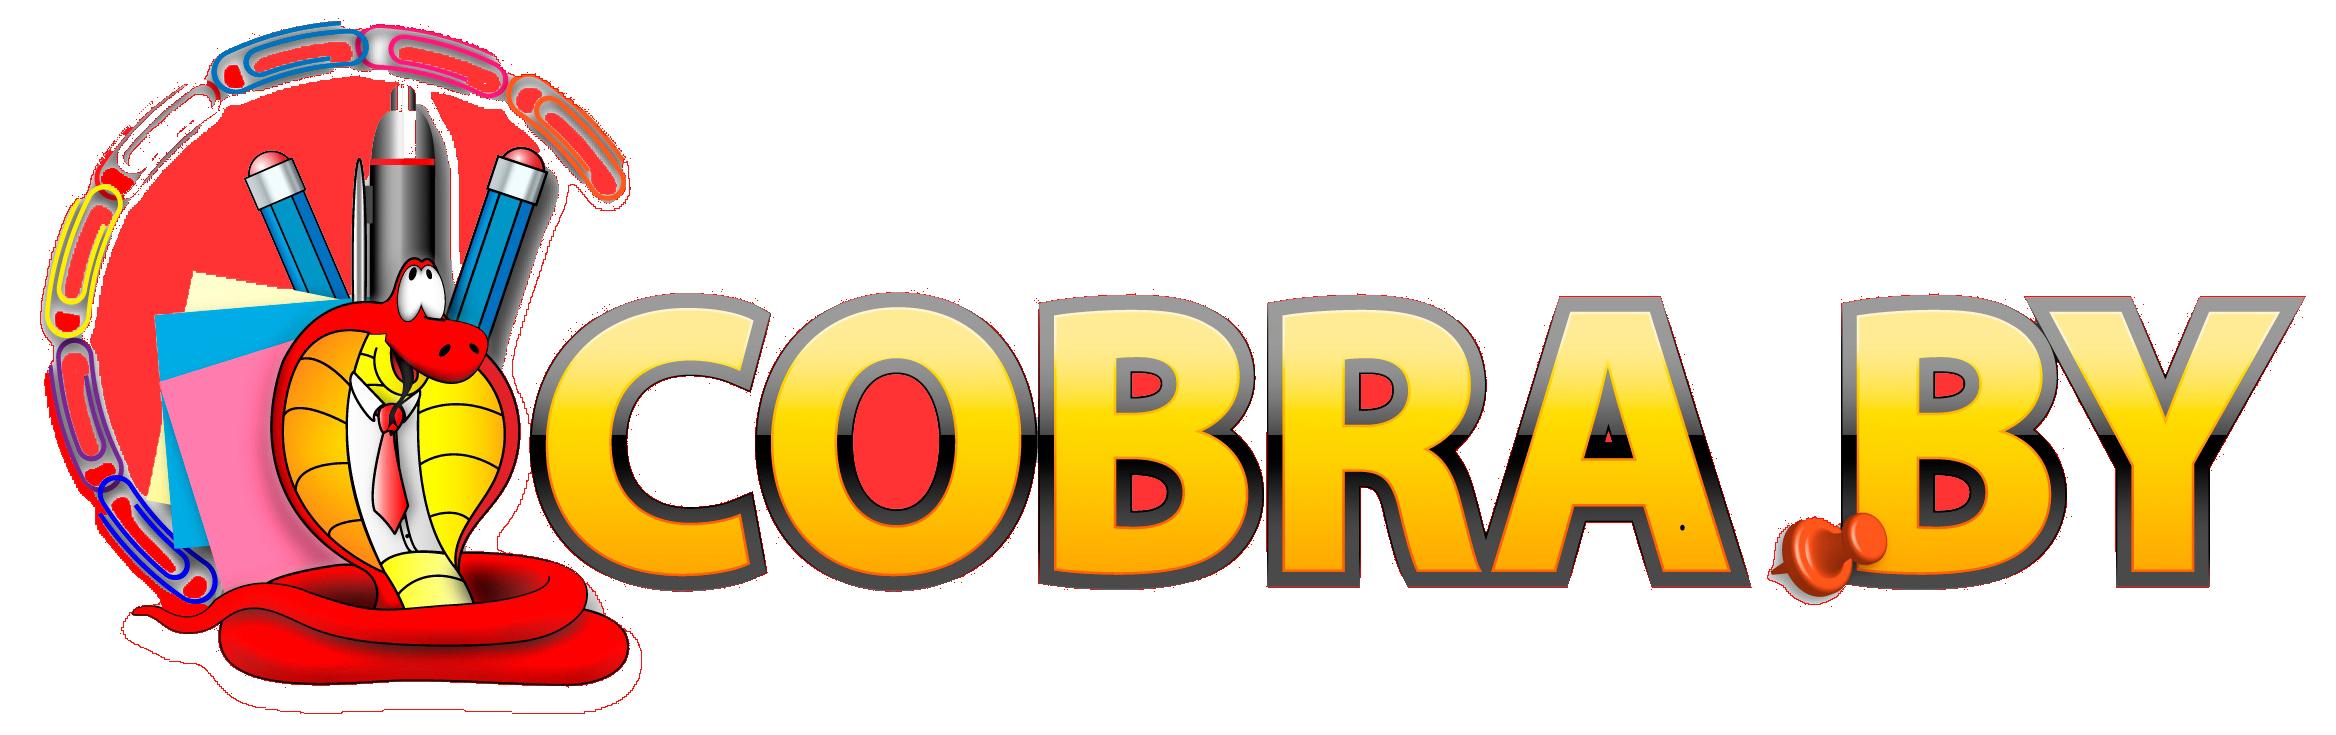 cobra.by